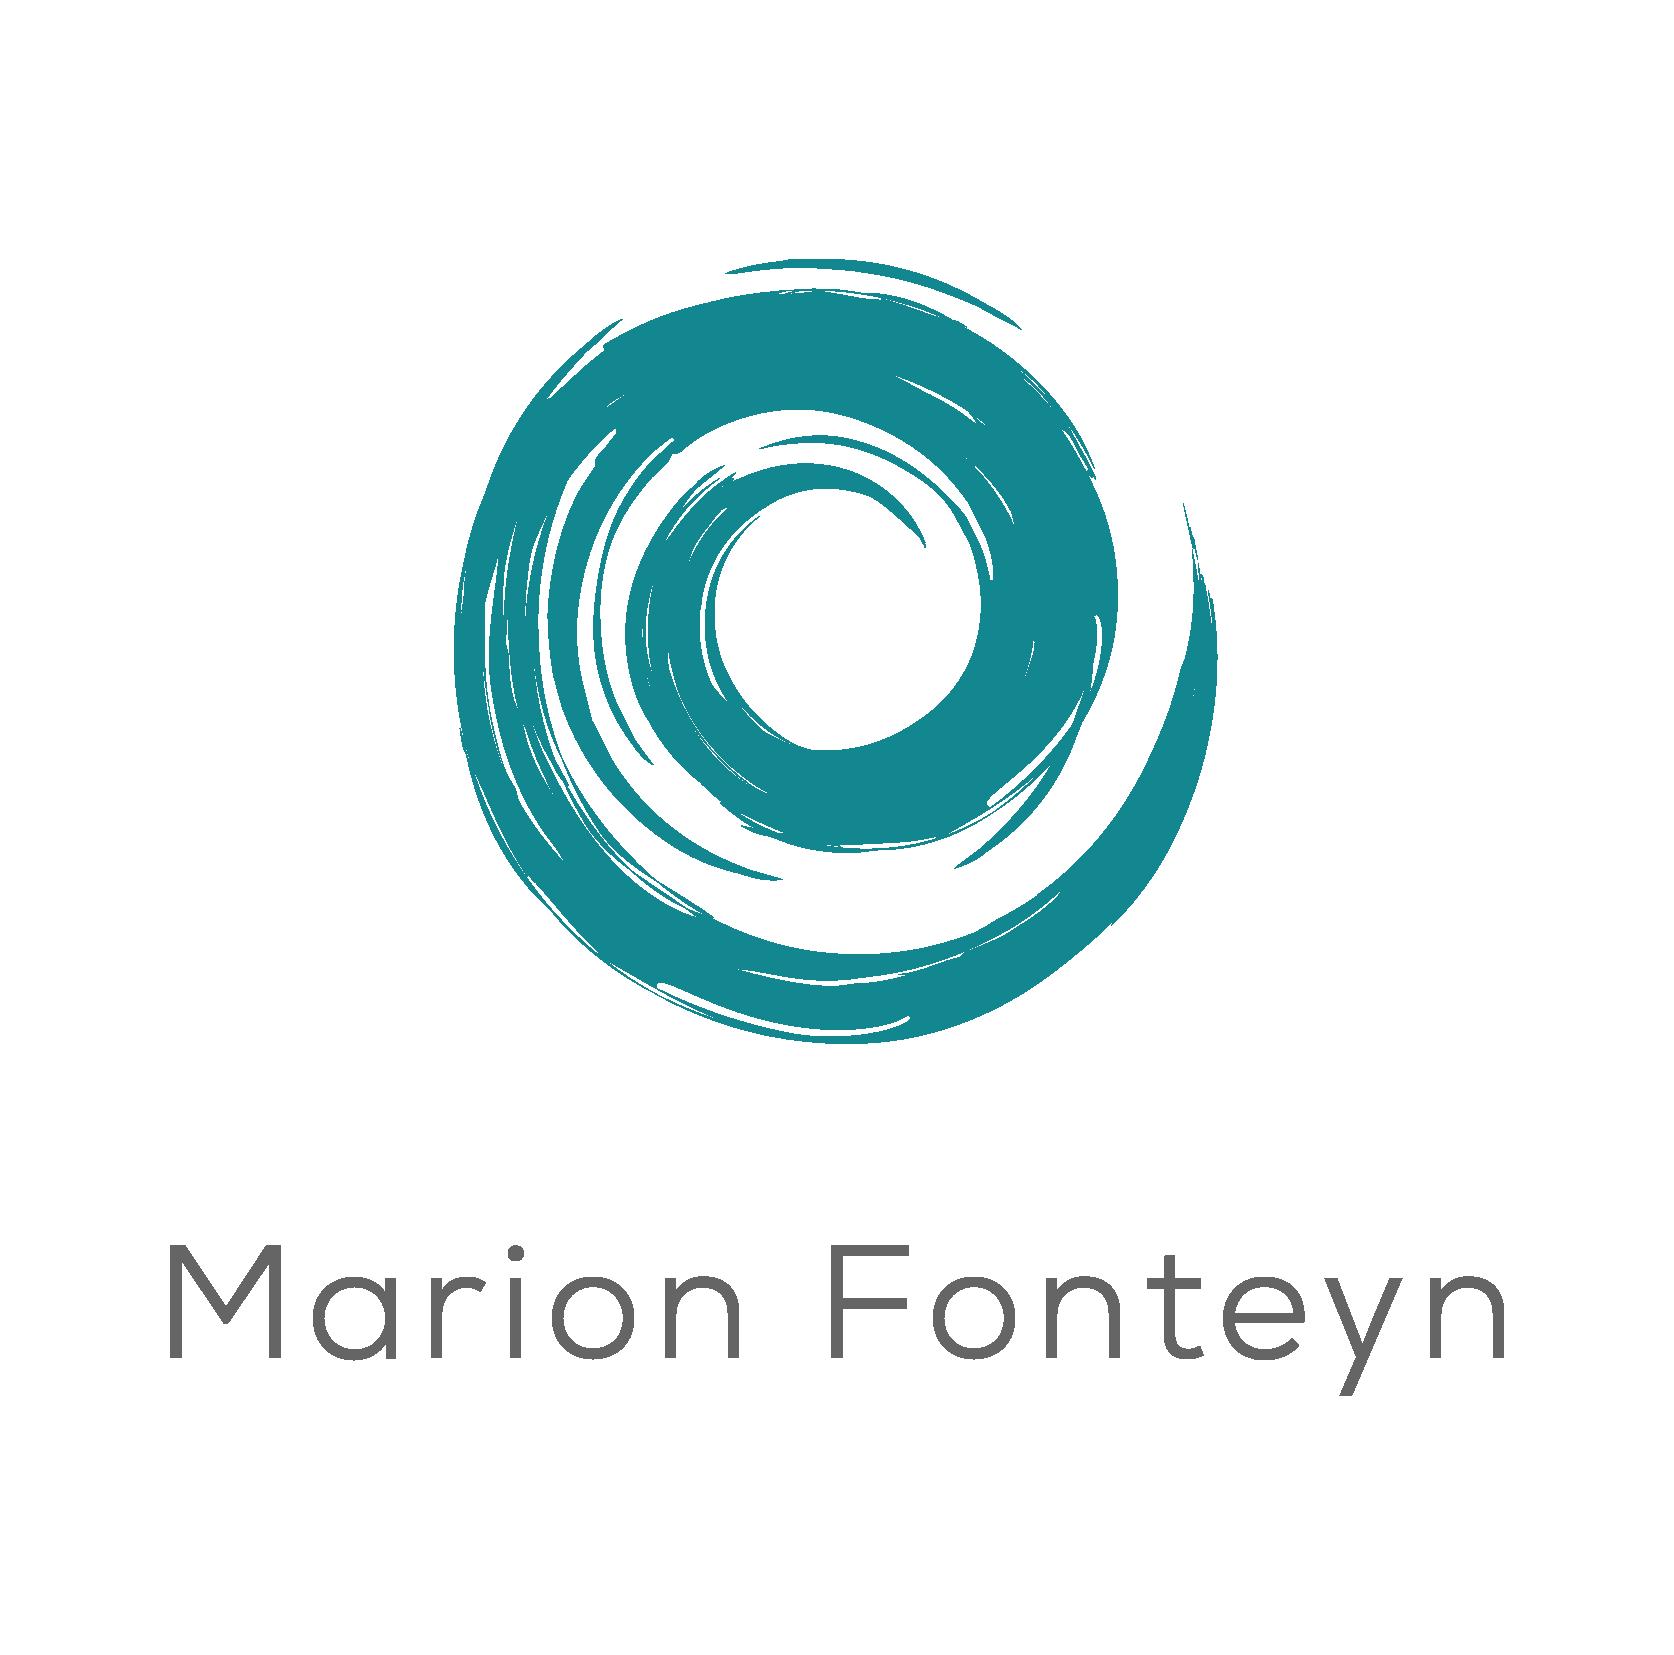 Marion Fonteyn